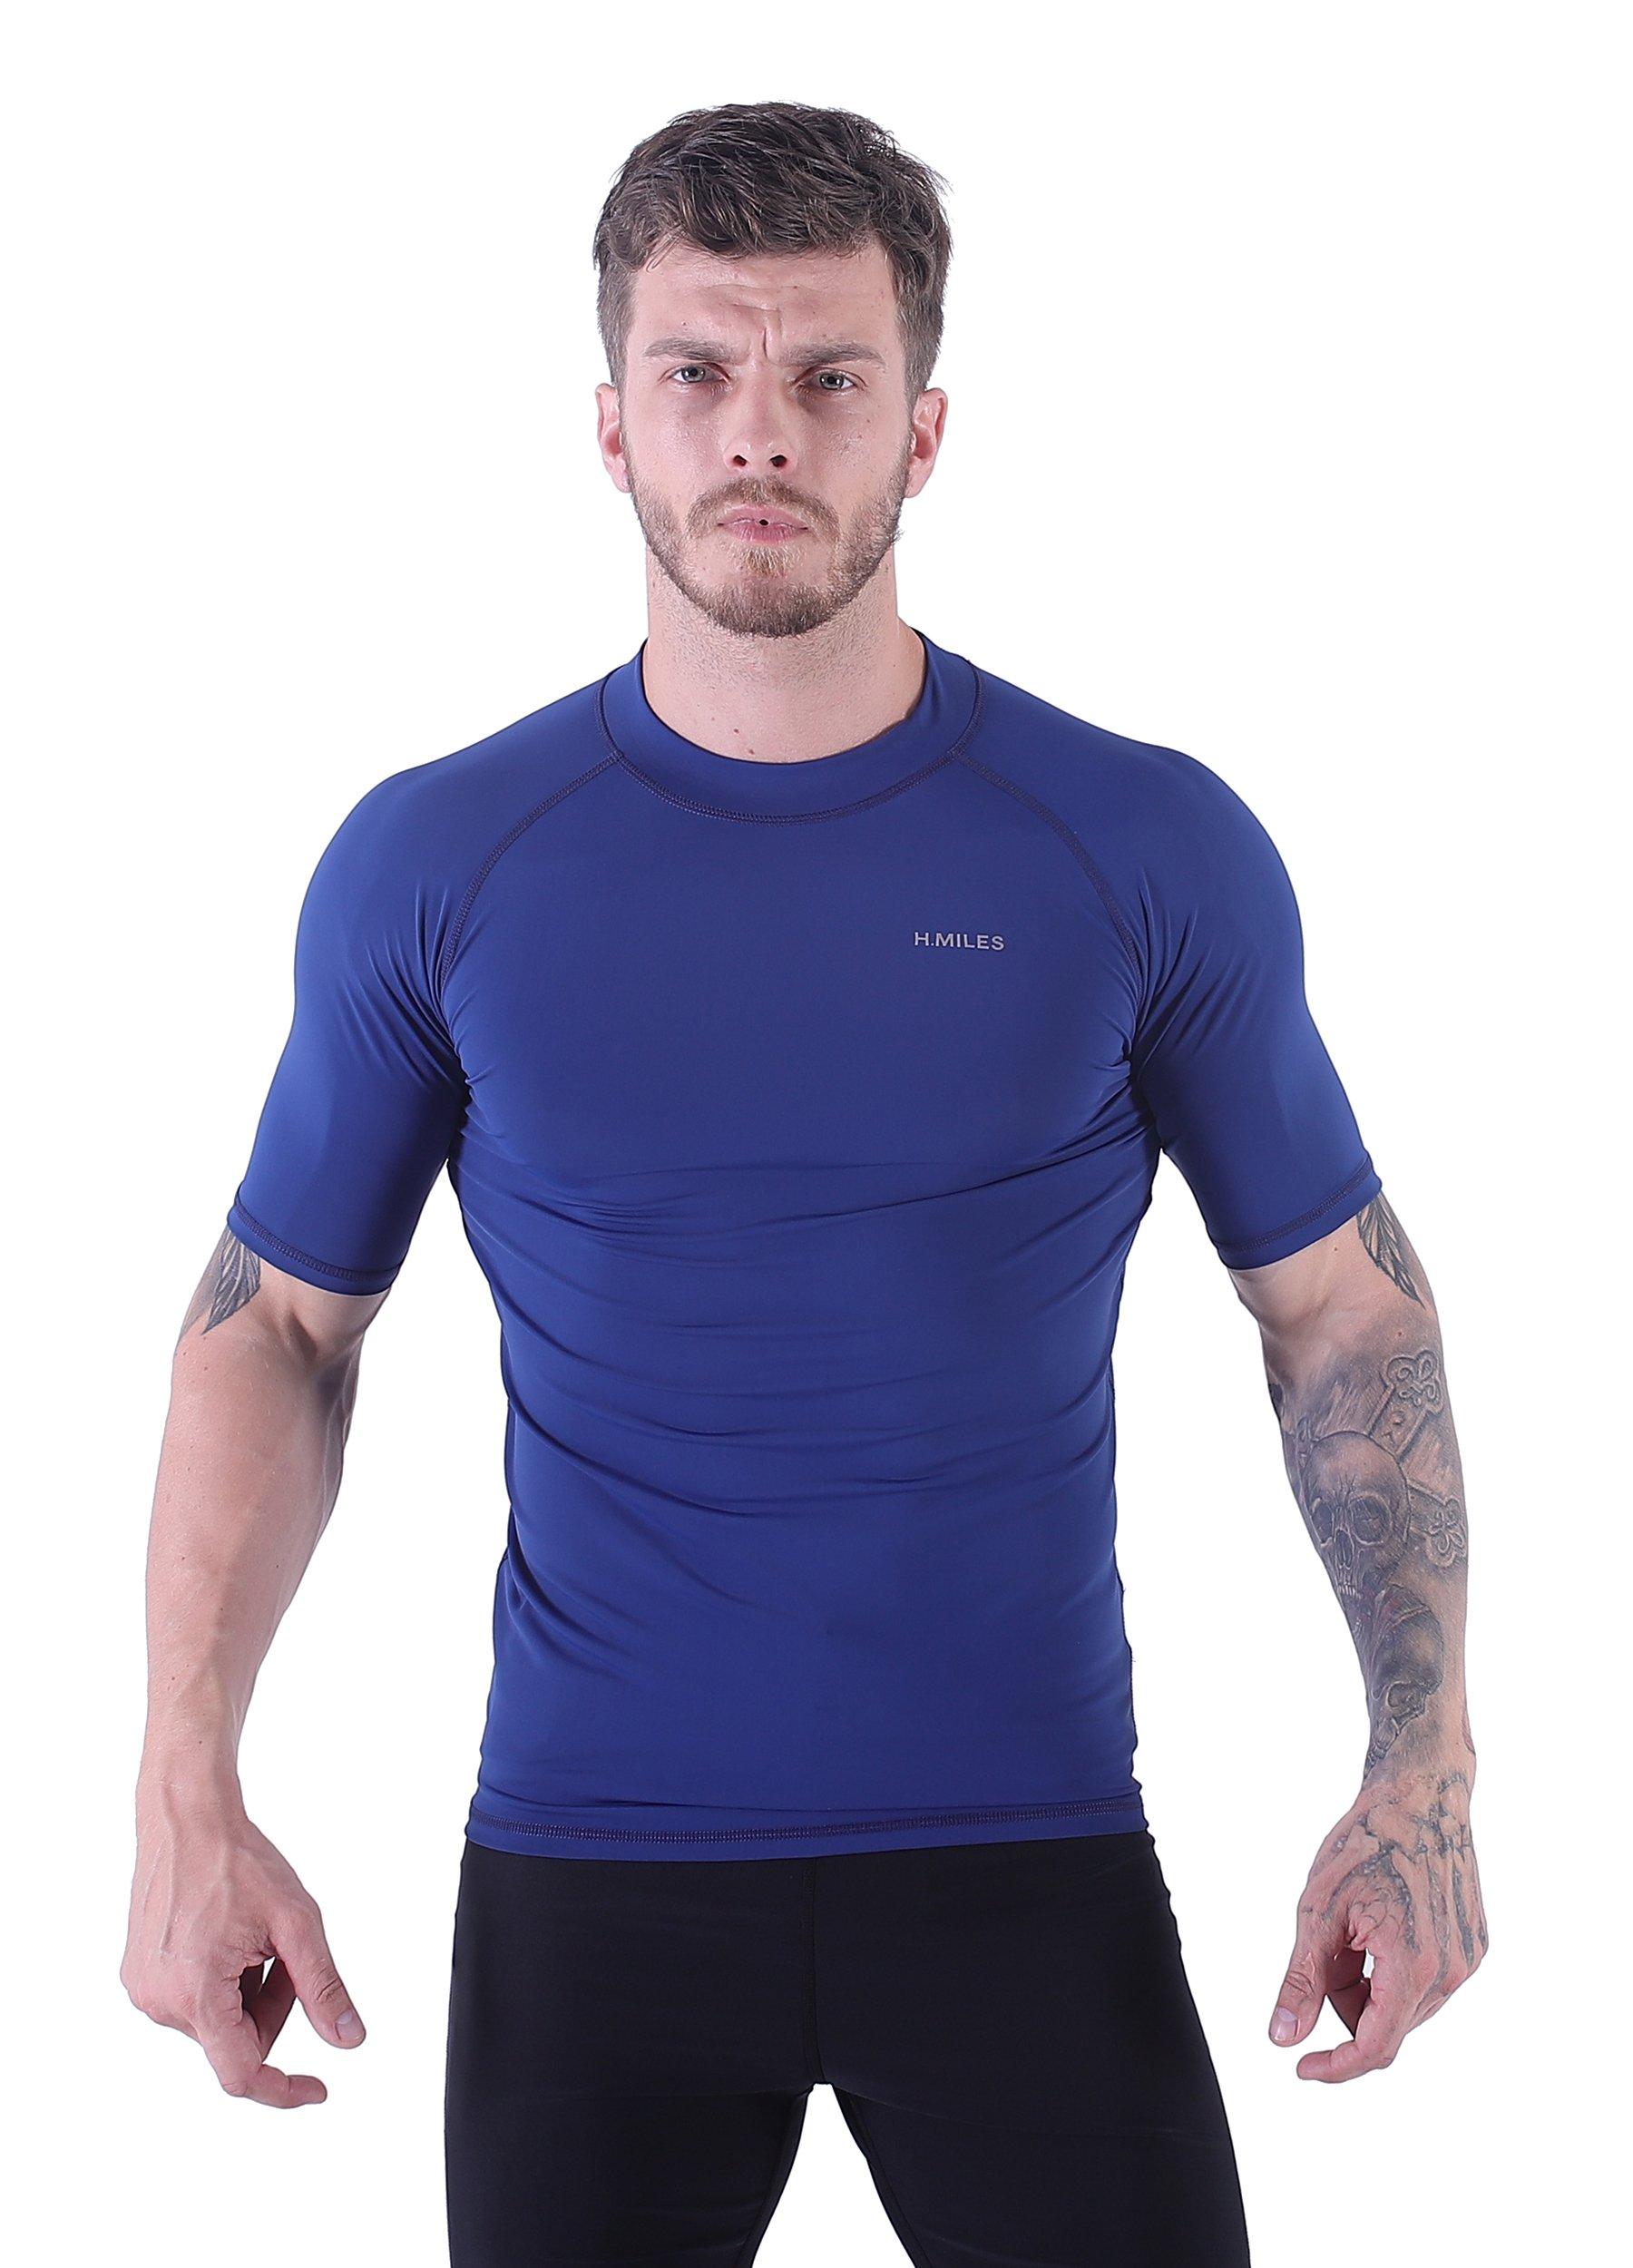 H.MILES Mens UV Protection Rash Guard Swim Shirts Short Sleeve Moisture Wicking Swimming Shirts Workout Swimwear Tops Sapphire-M by H.MILES